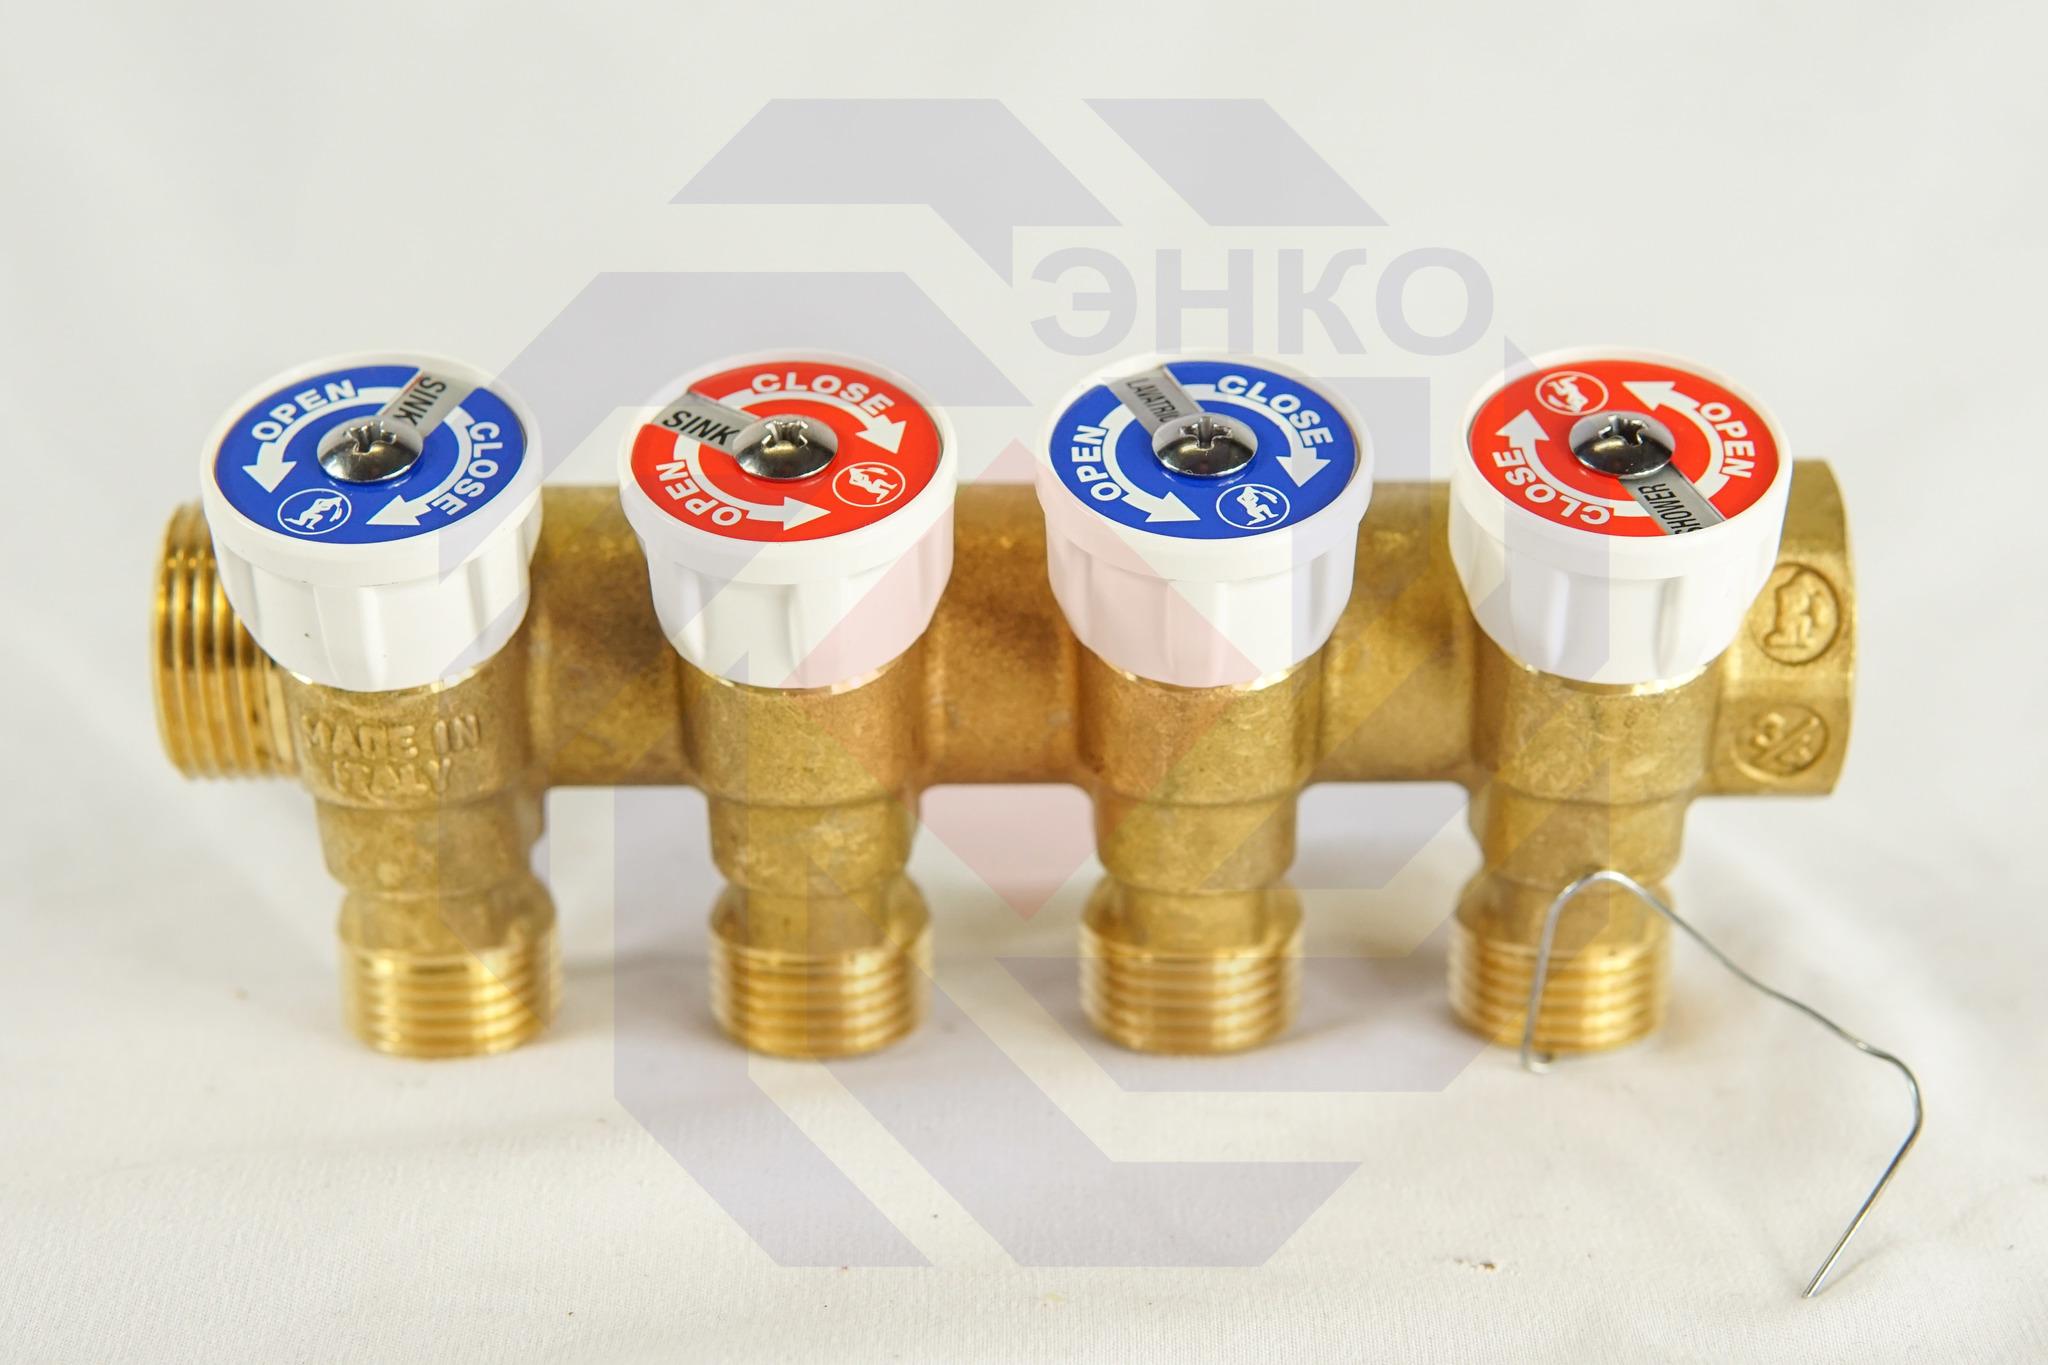 Коллектор сантехнический с отсечными клапанами GIACOMINI R585С 4 отвода